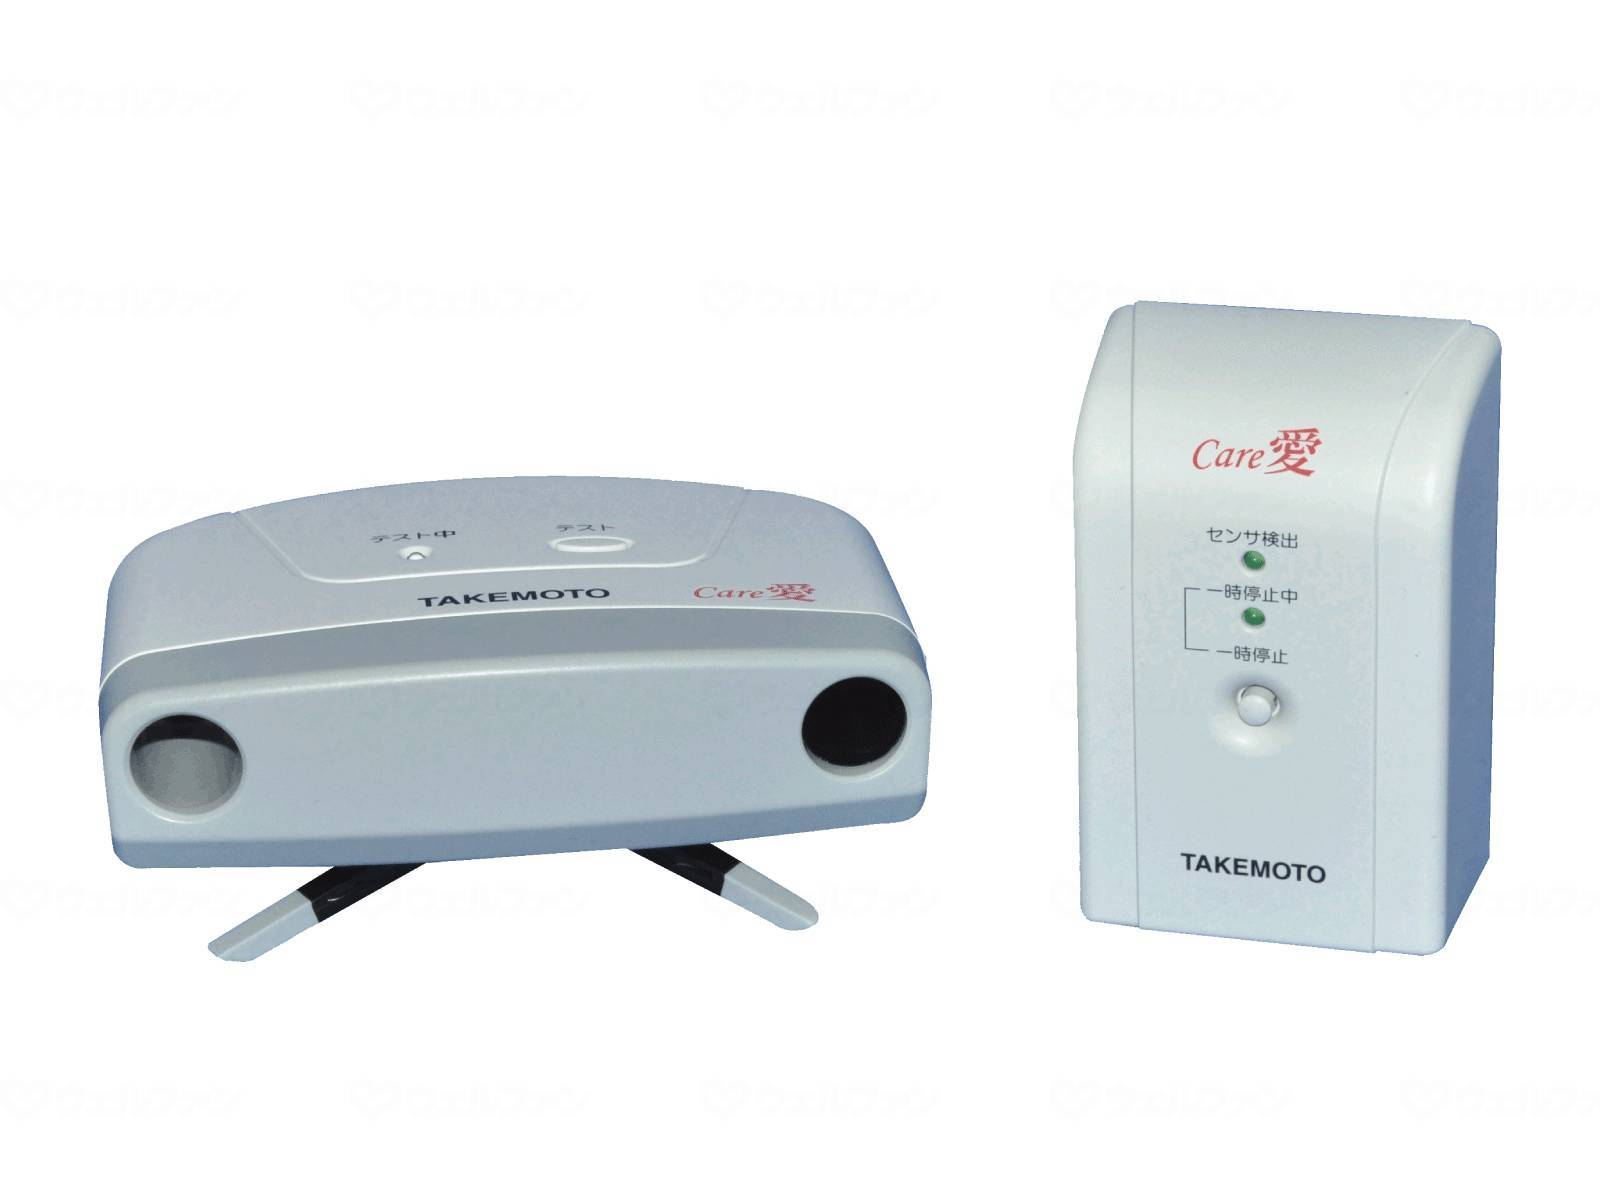 Care愛 超音波離床センサー(有線タイプ)